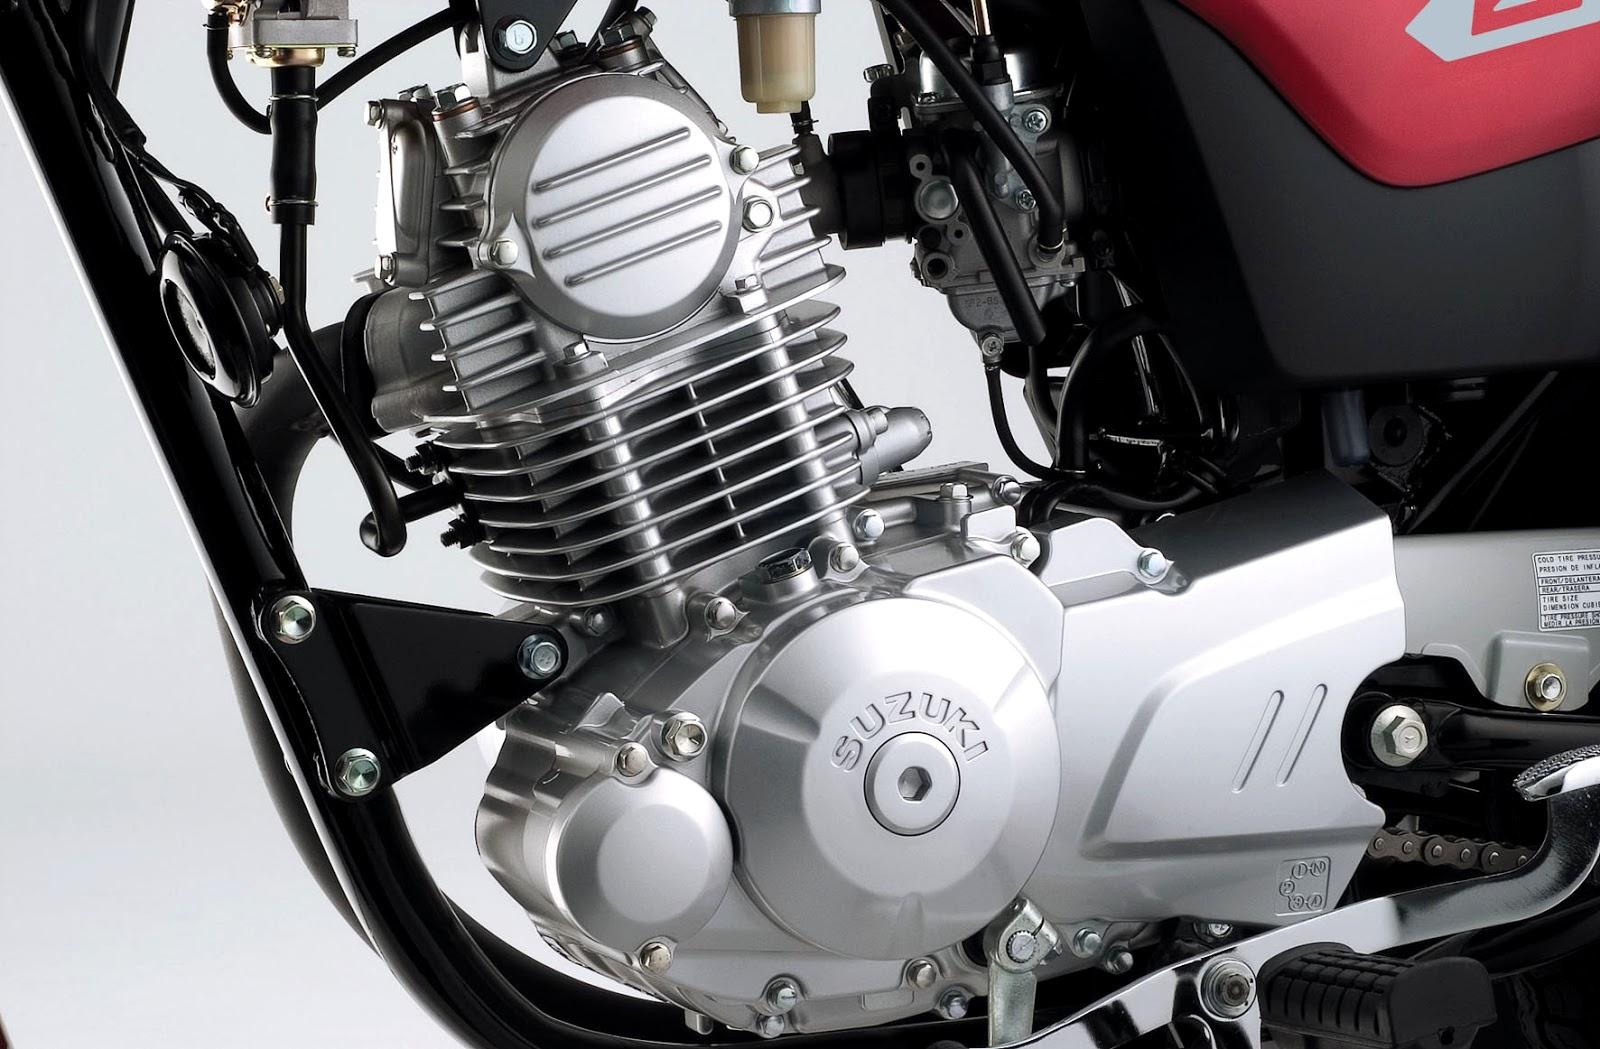 Motor da nova Suzuki GS 120 - Brazil 2013